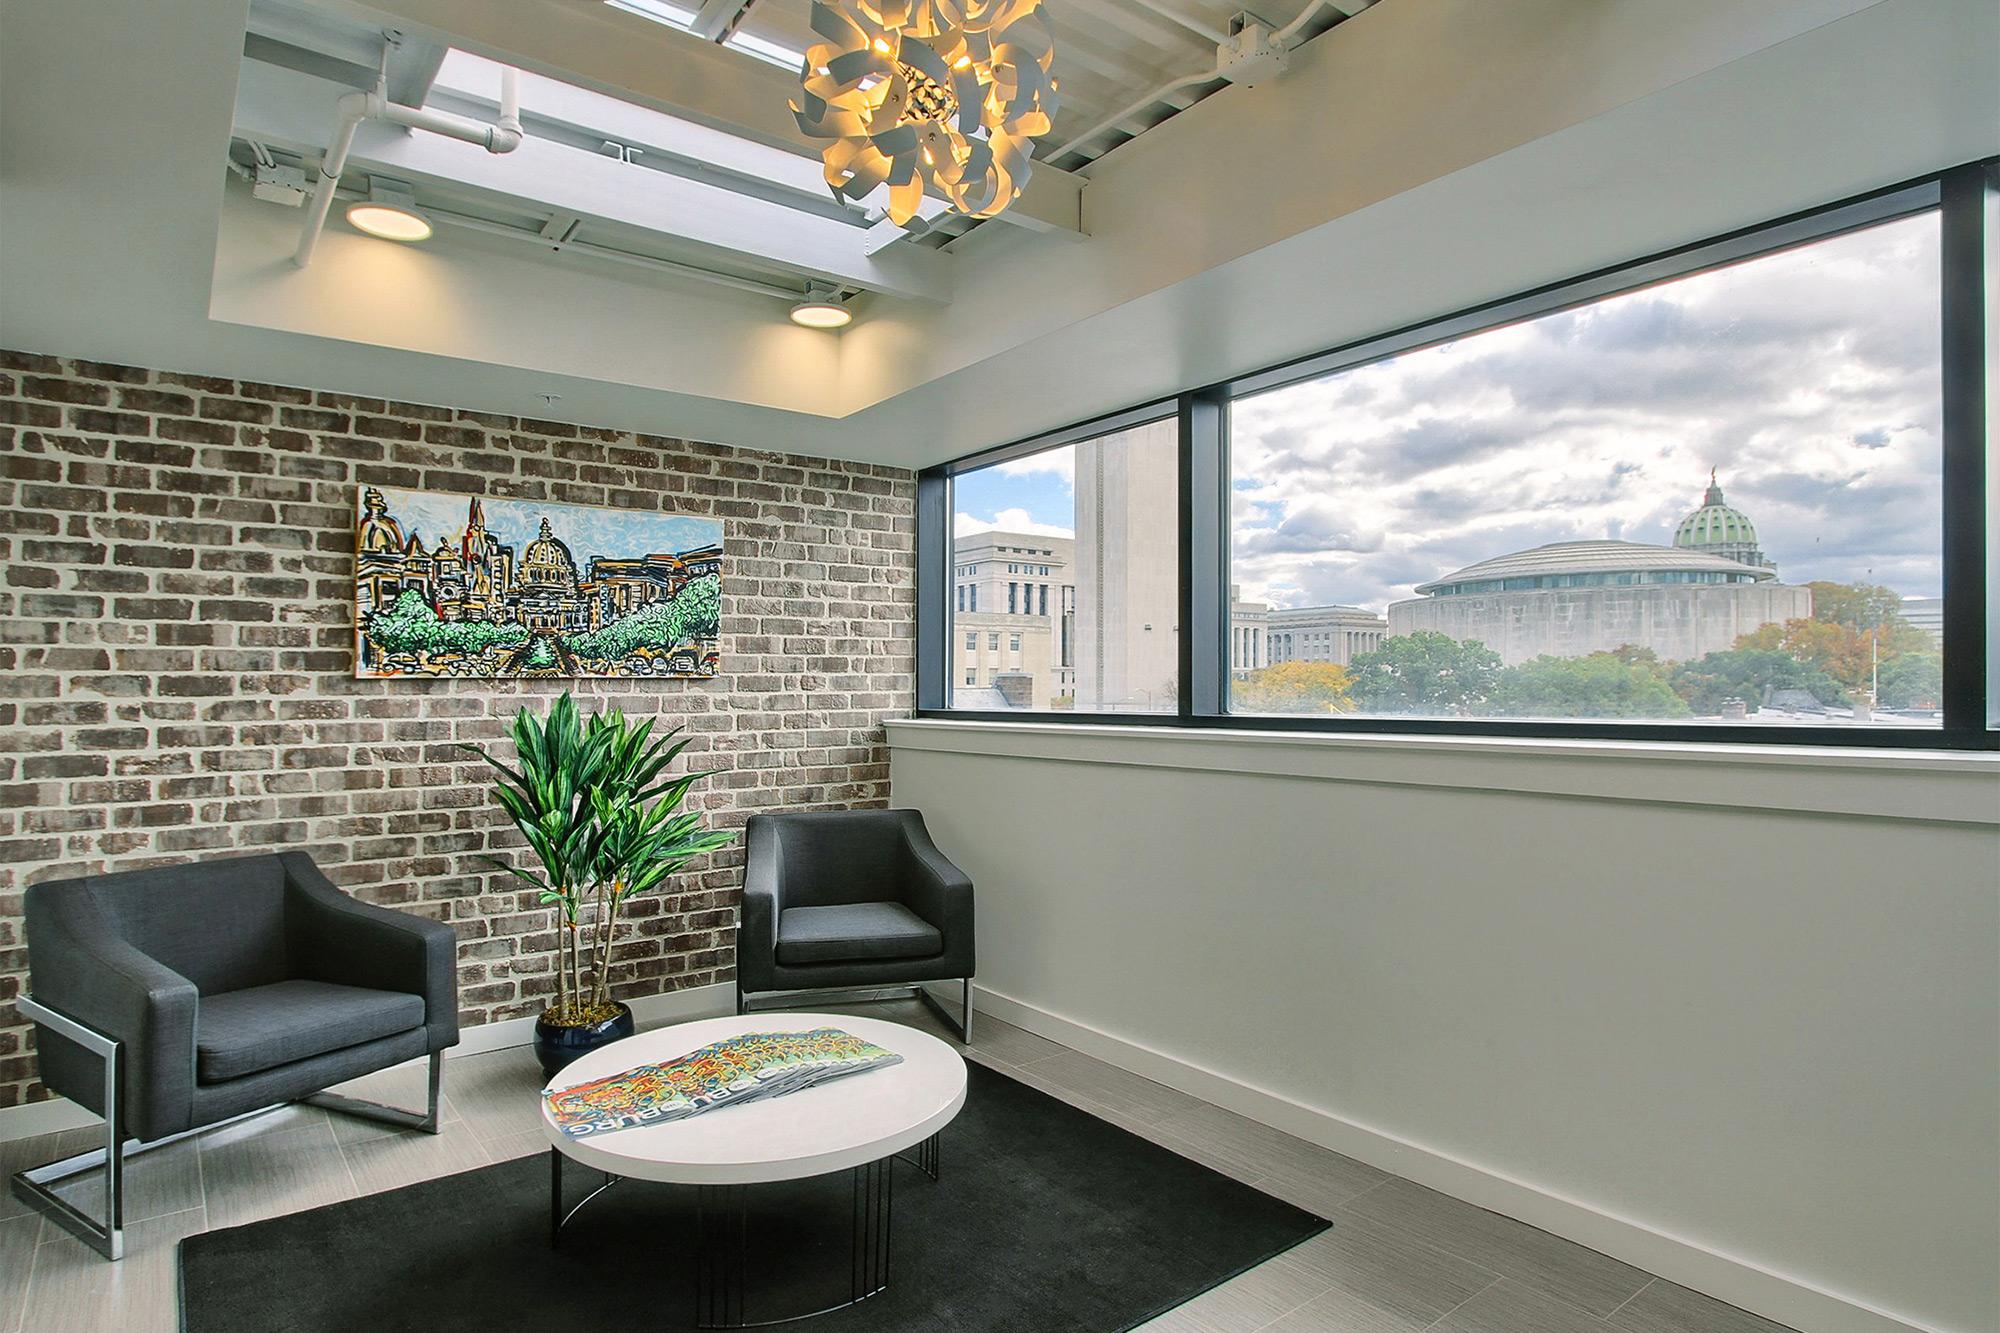 union-lofts-lobby-2.jpg